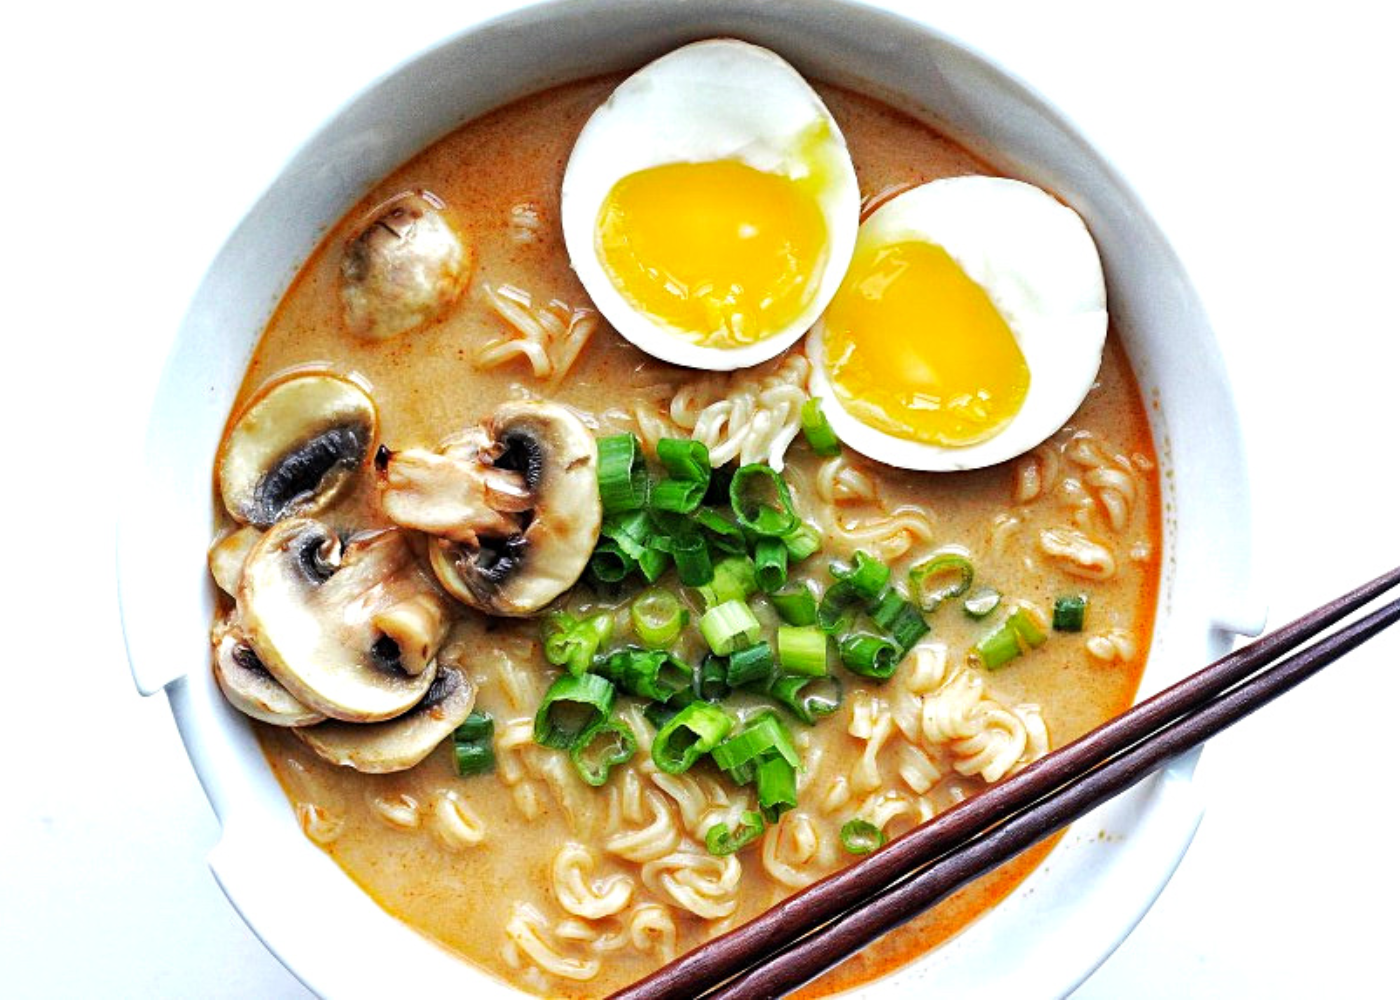 Best upgraded instant noodle recipes: Miso ramen